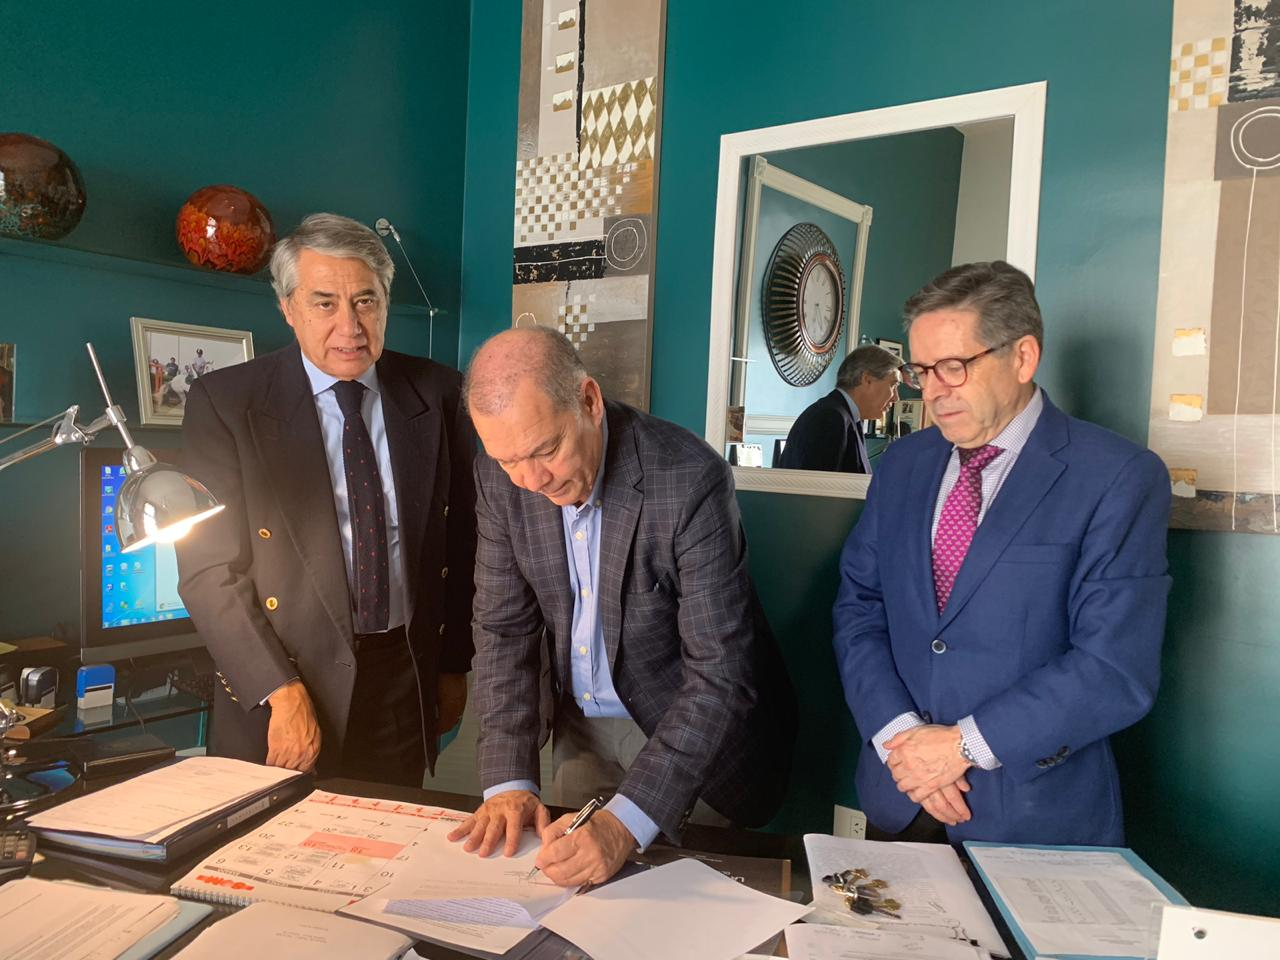 Ministros señores Cristián Letelier Aguilar y Nelson Pozo Silva firman pre convenio con representante de Universidad de Bolonia para América Latina